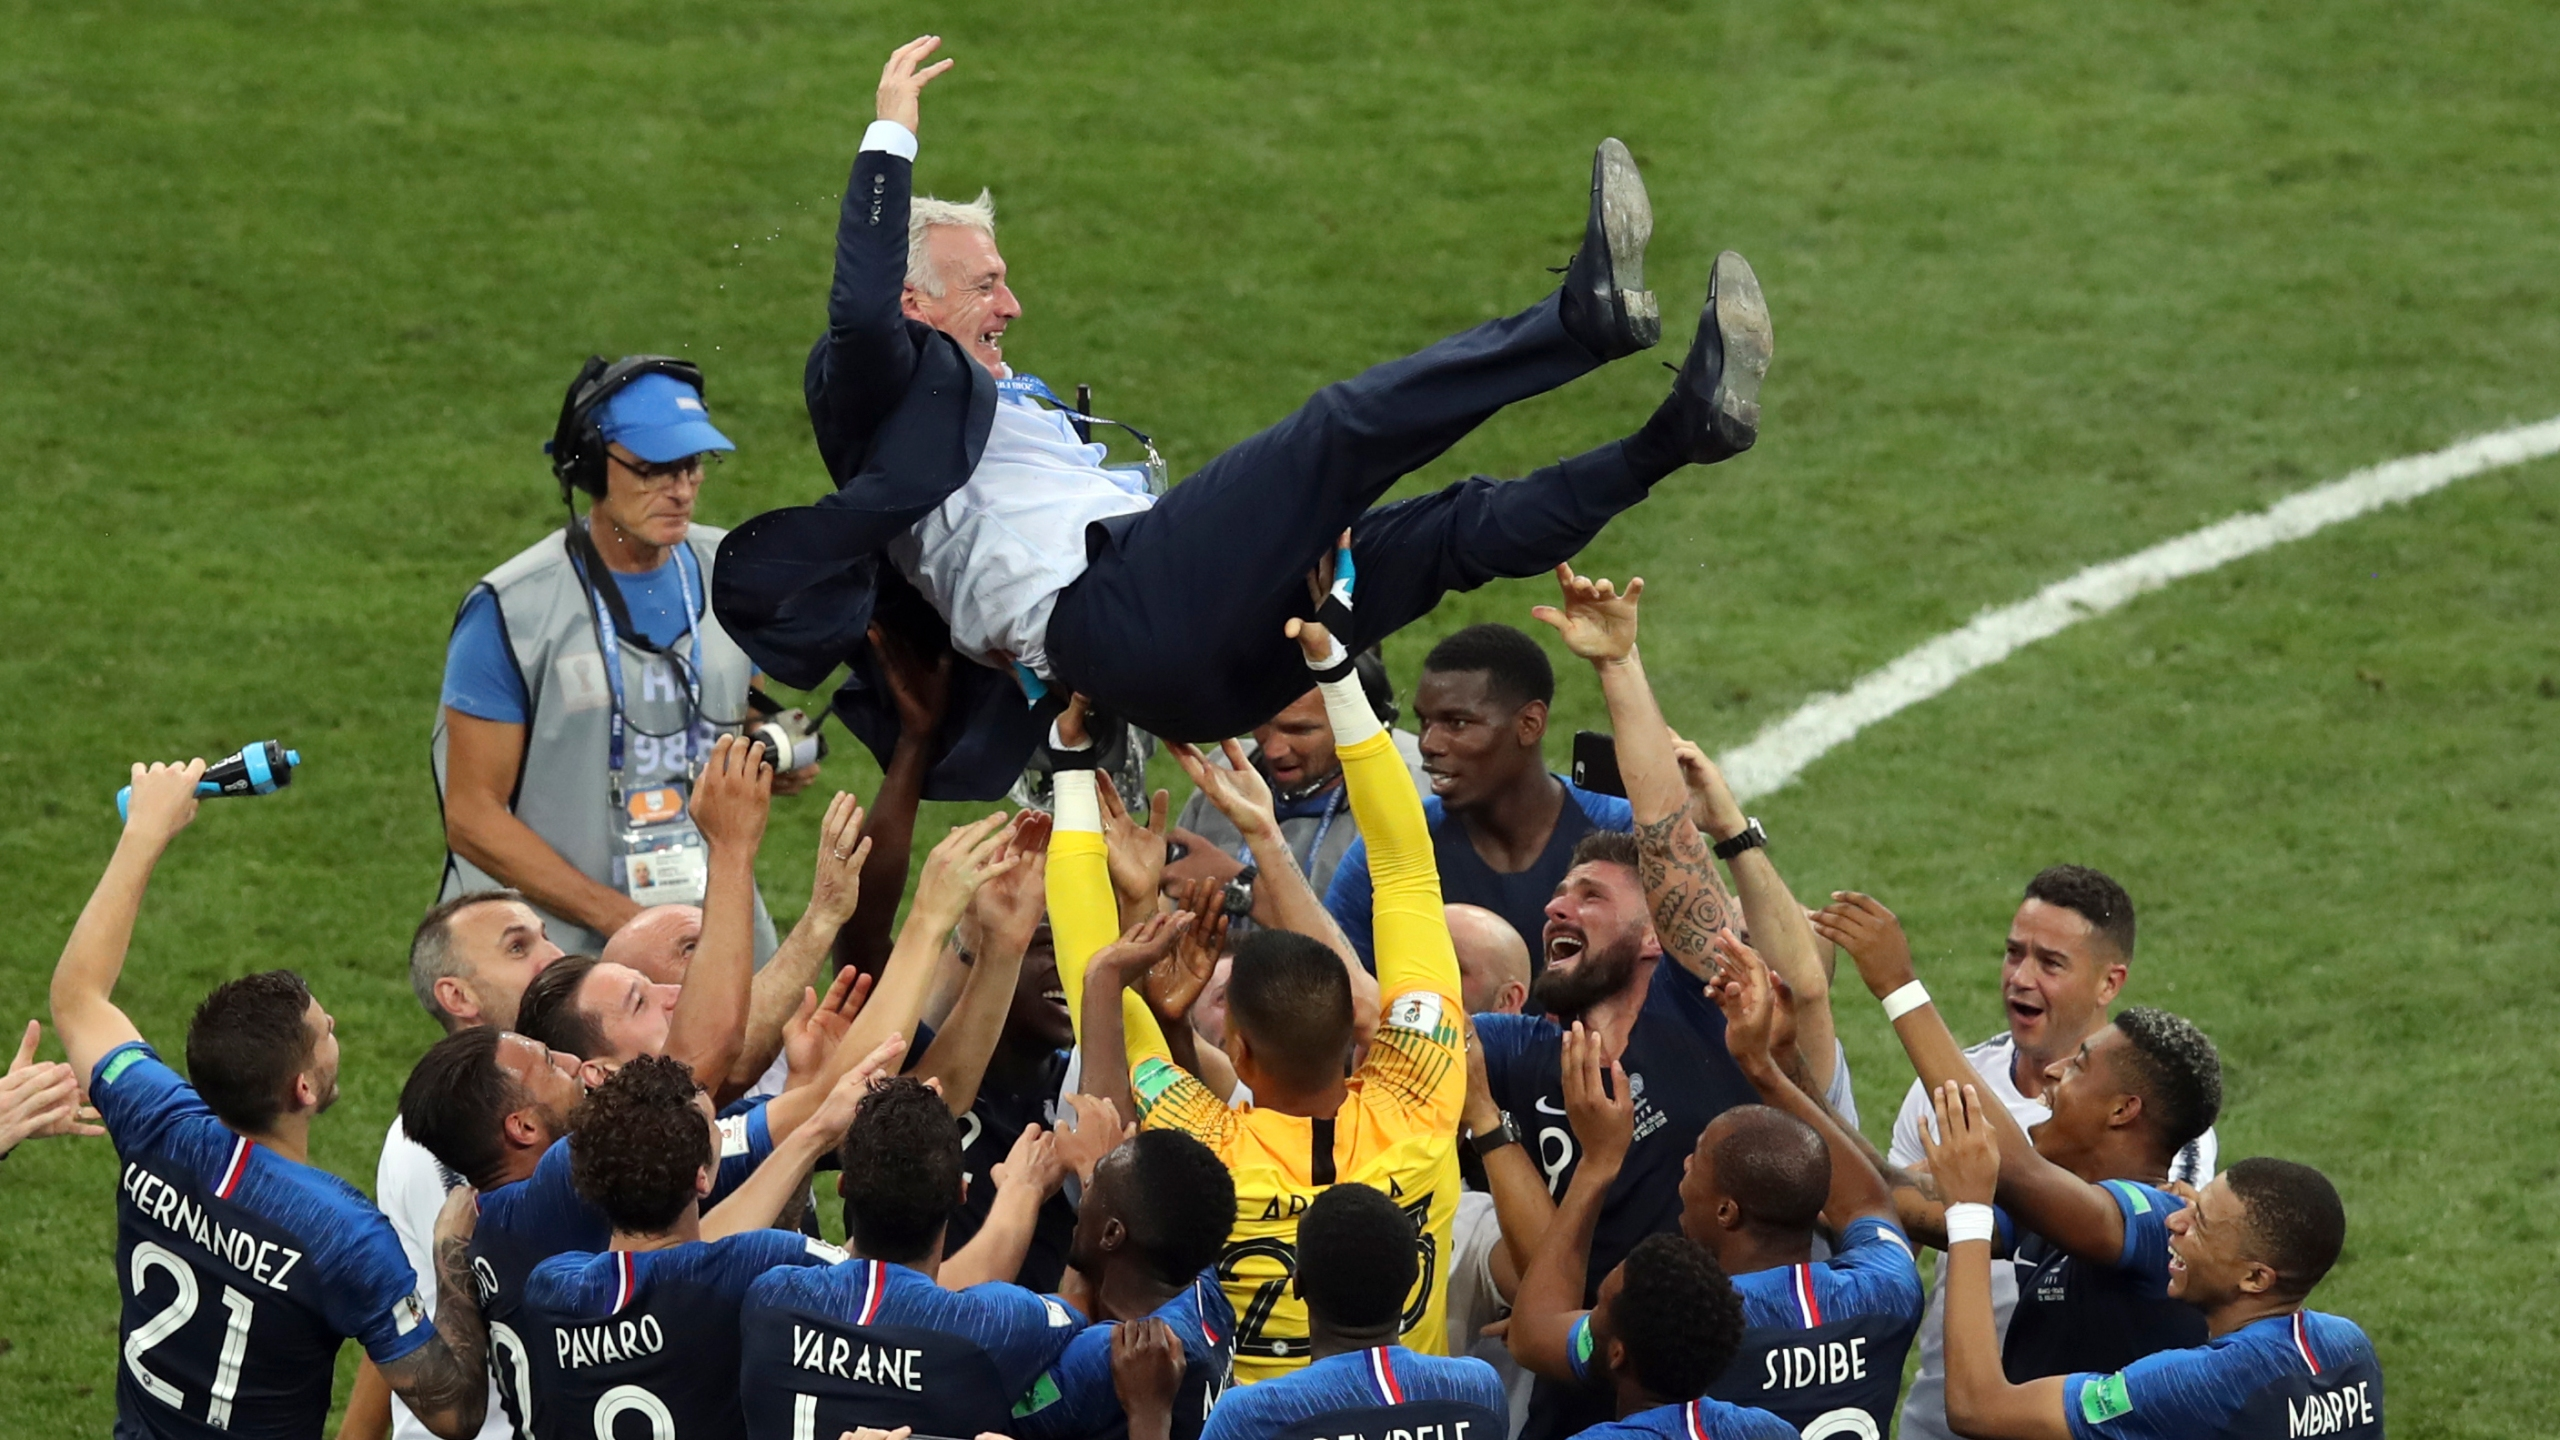 APTOPIX_Russia_Soccer_WCup_France_Croatia_09096-159532.jpg92247716